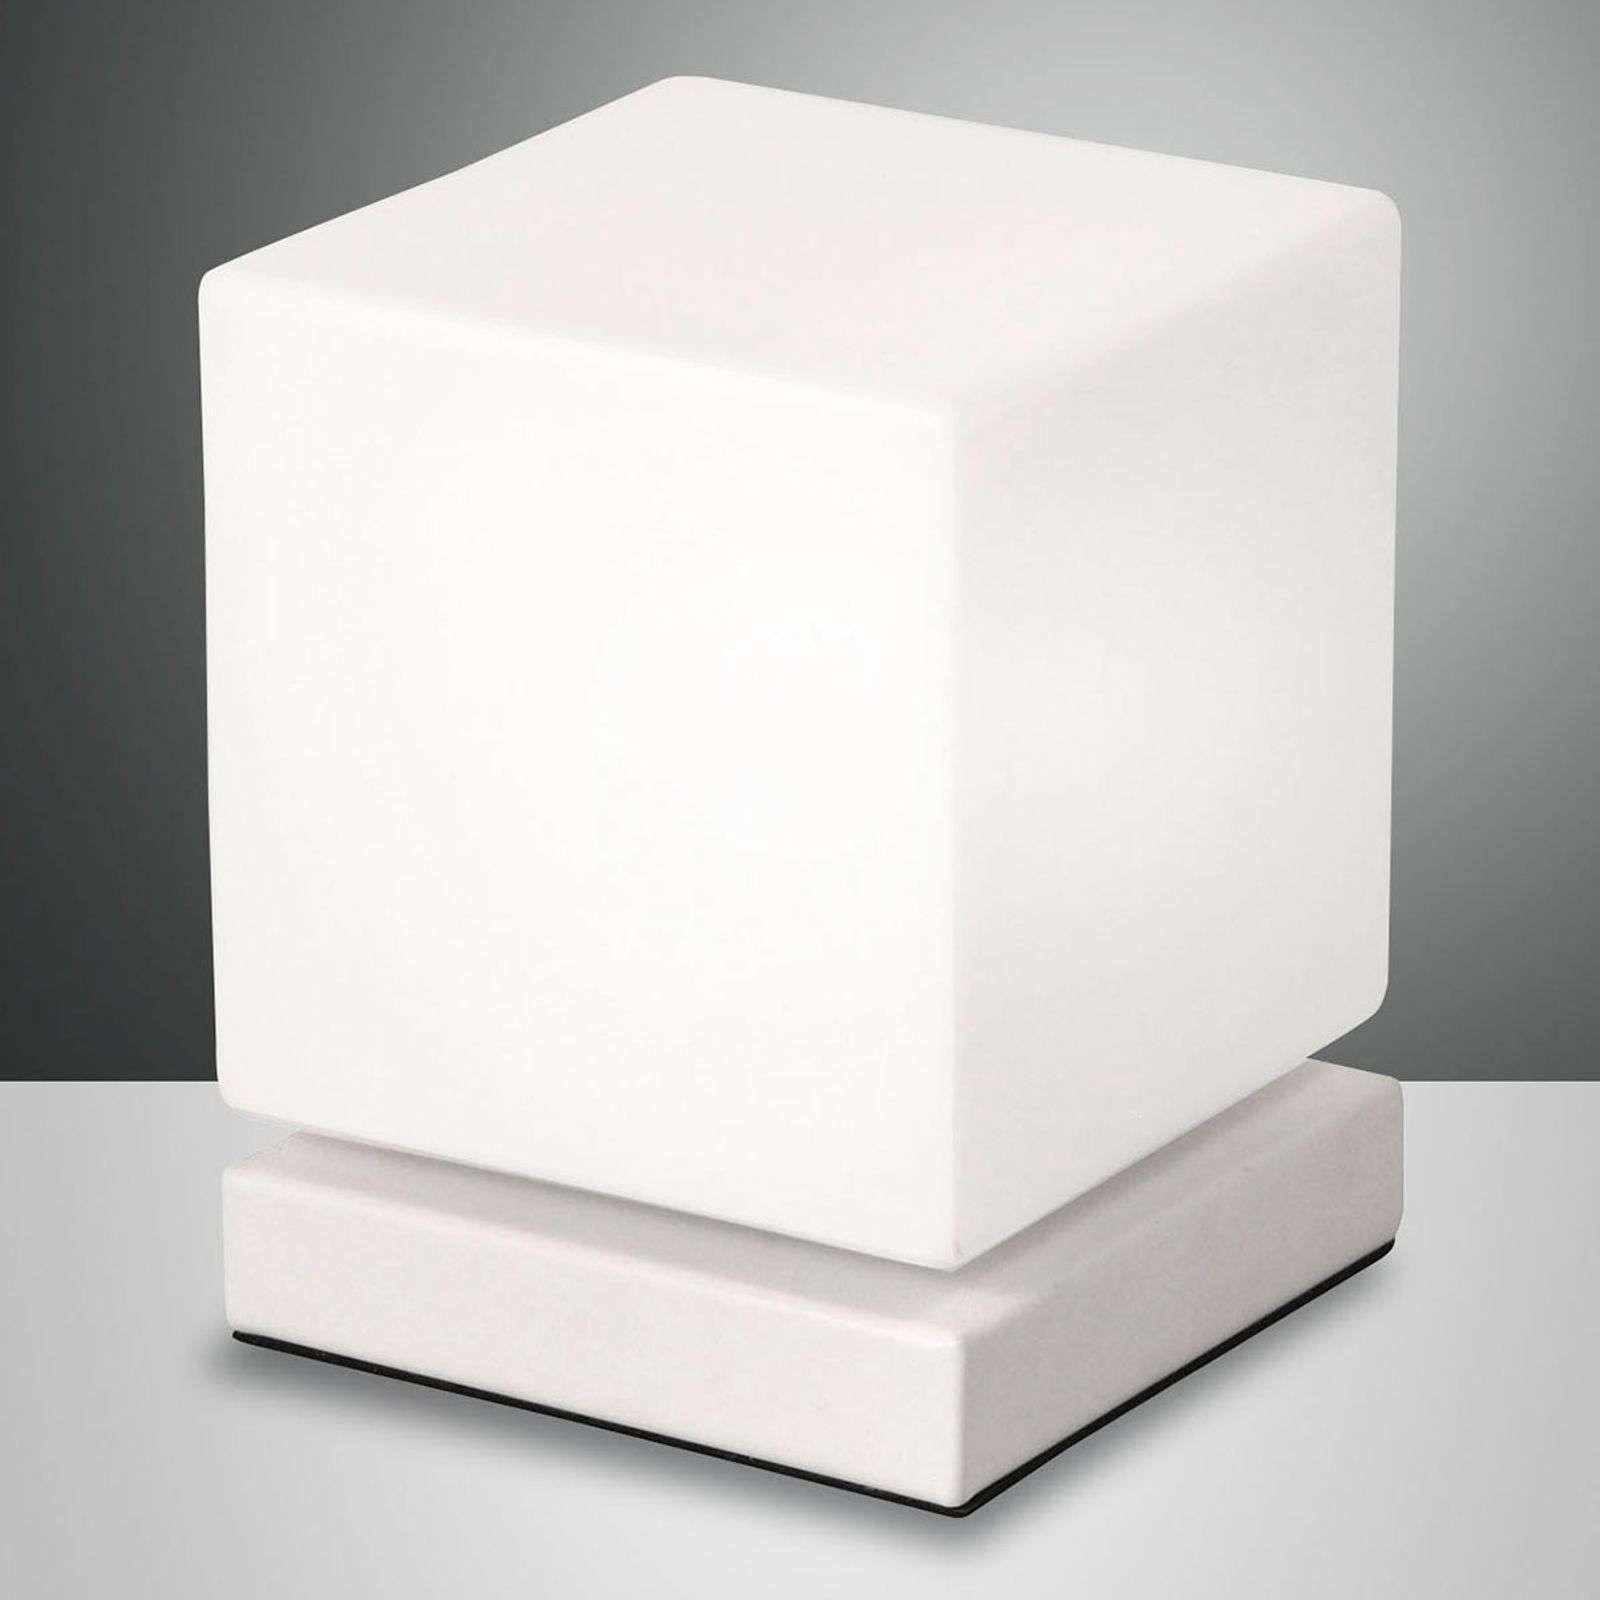 Met Aanraakdimmer Led Tafellamp Brenta Wit Tafellamp Moderne Lampen Led